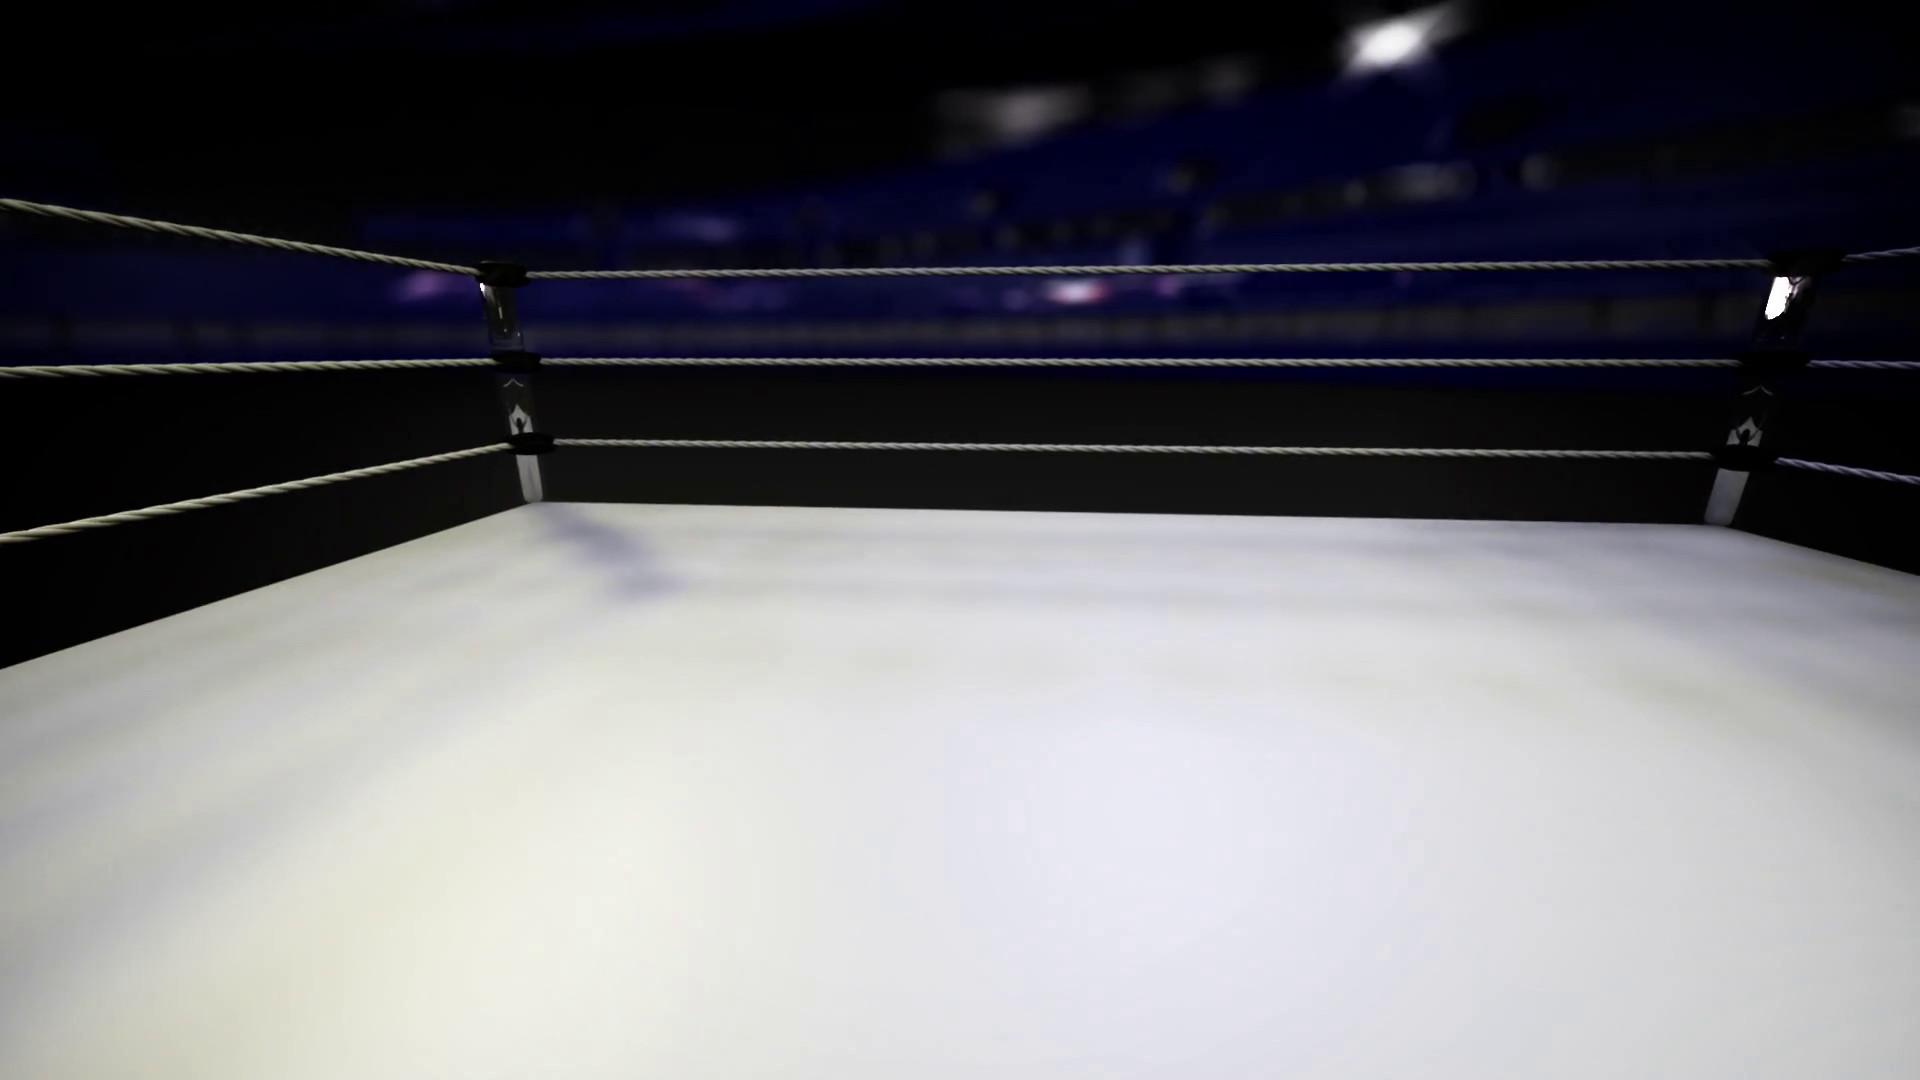 Res: 1920x1080, Inside Rotating Wrestilng Boxing Ring Background Motion Background -  Videoblocks